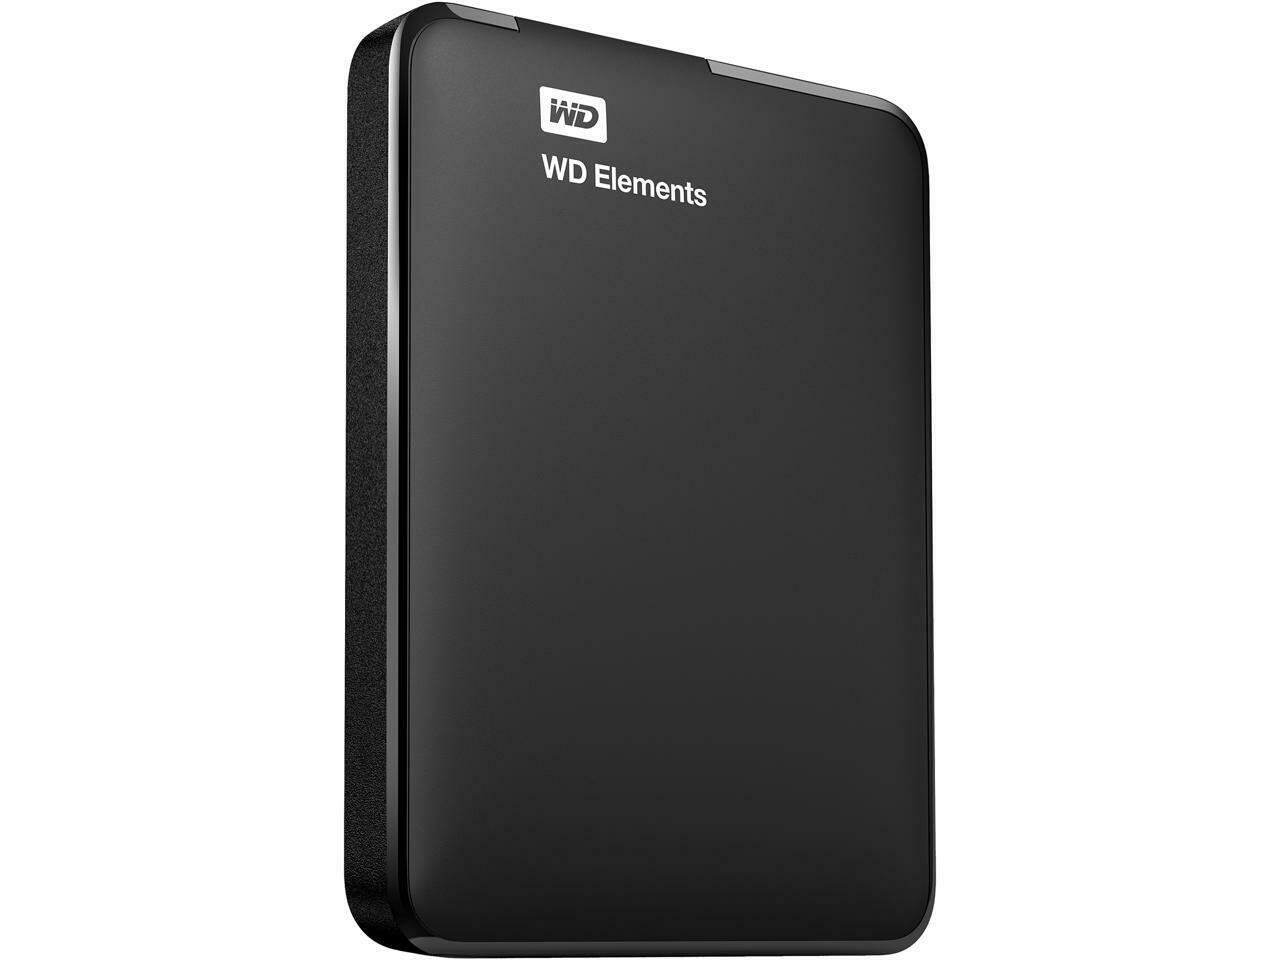 WD Elements 1TB Portable External Hard Drive - Black